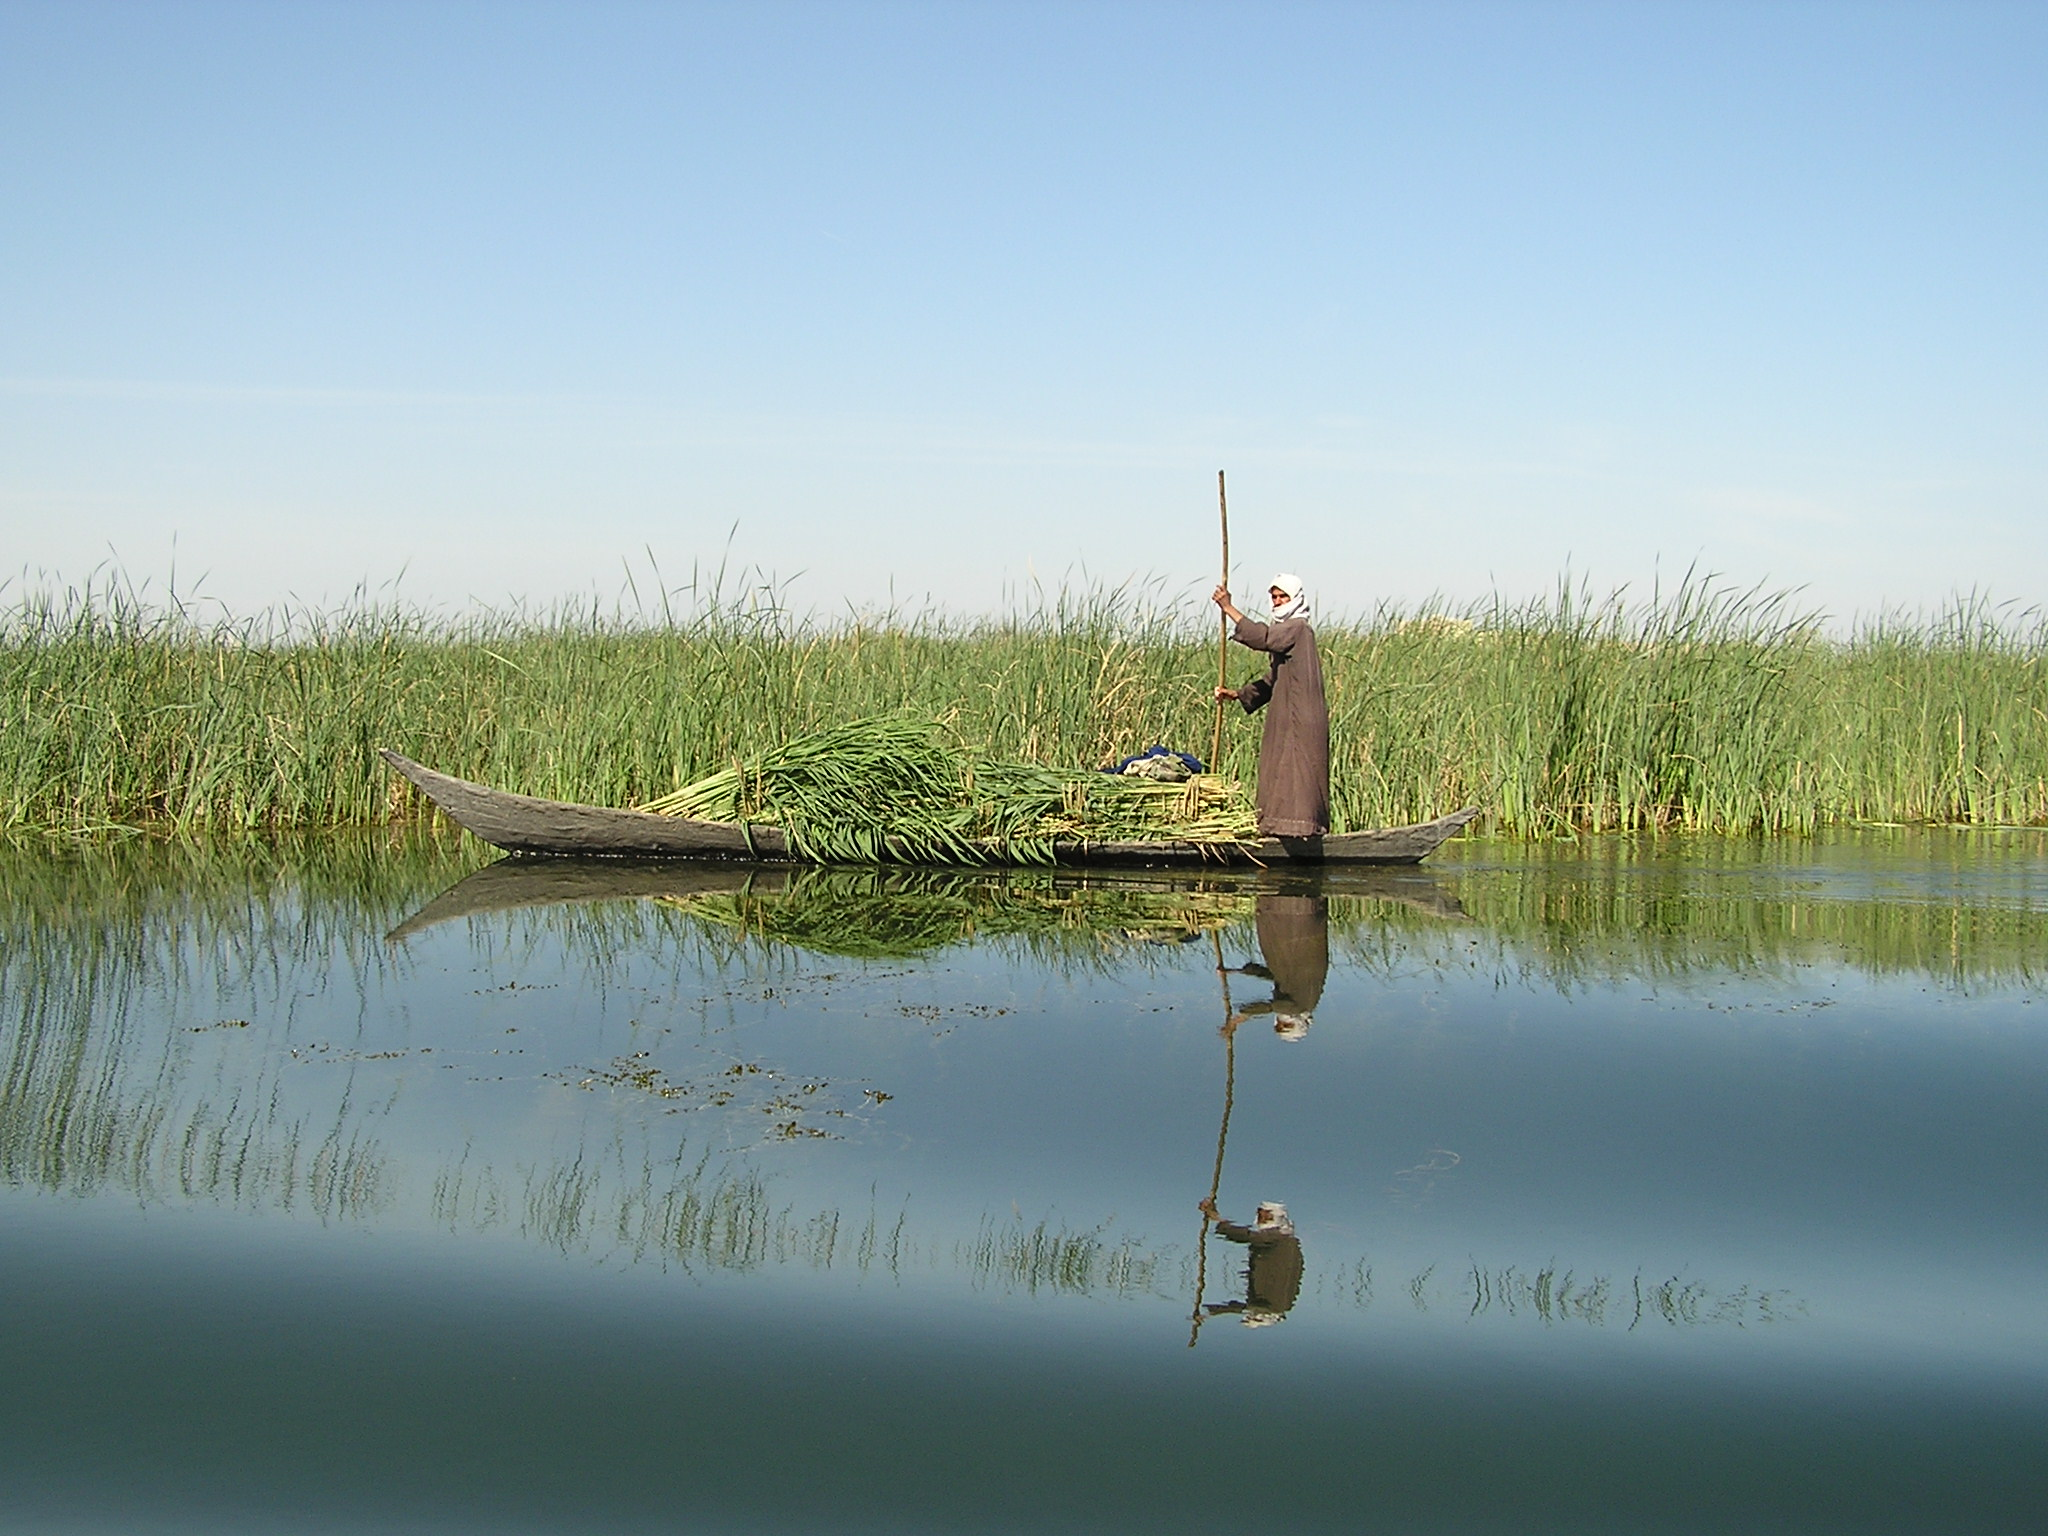 Against_the_mirror_in_the_Iraq_Marshes._Mudhafar_Salim,_Nature_Iraq.JPG